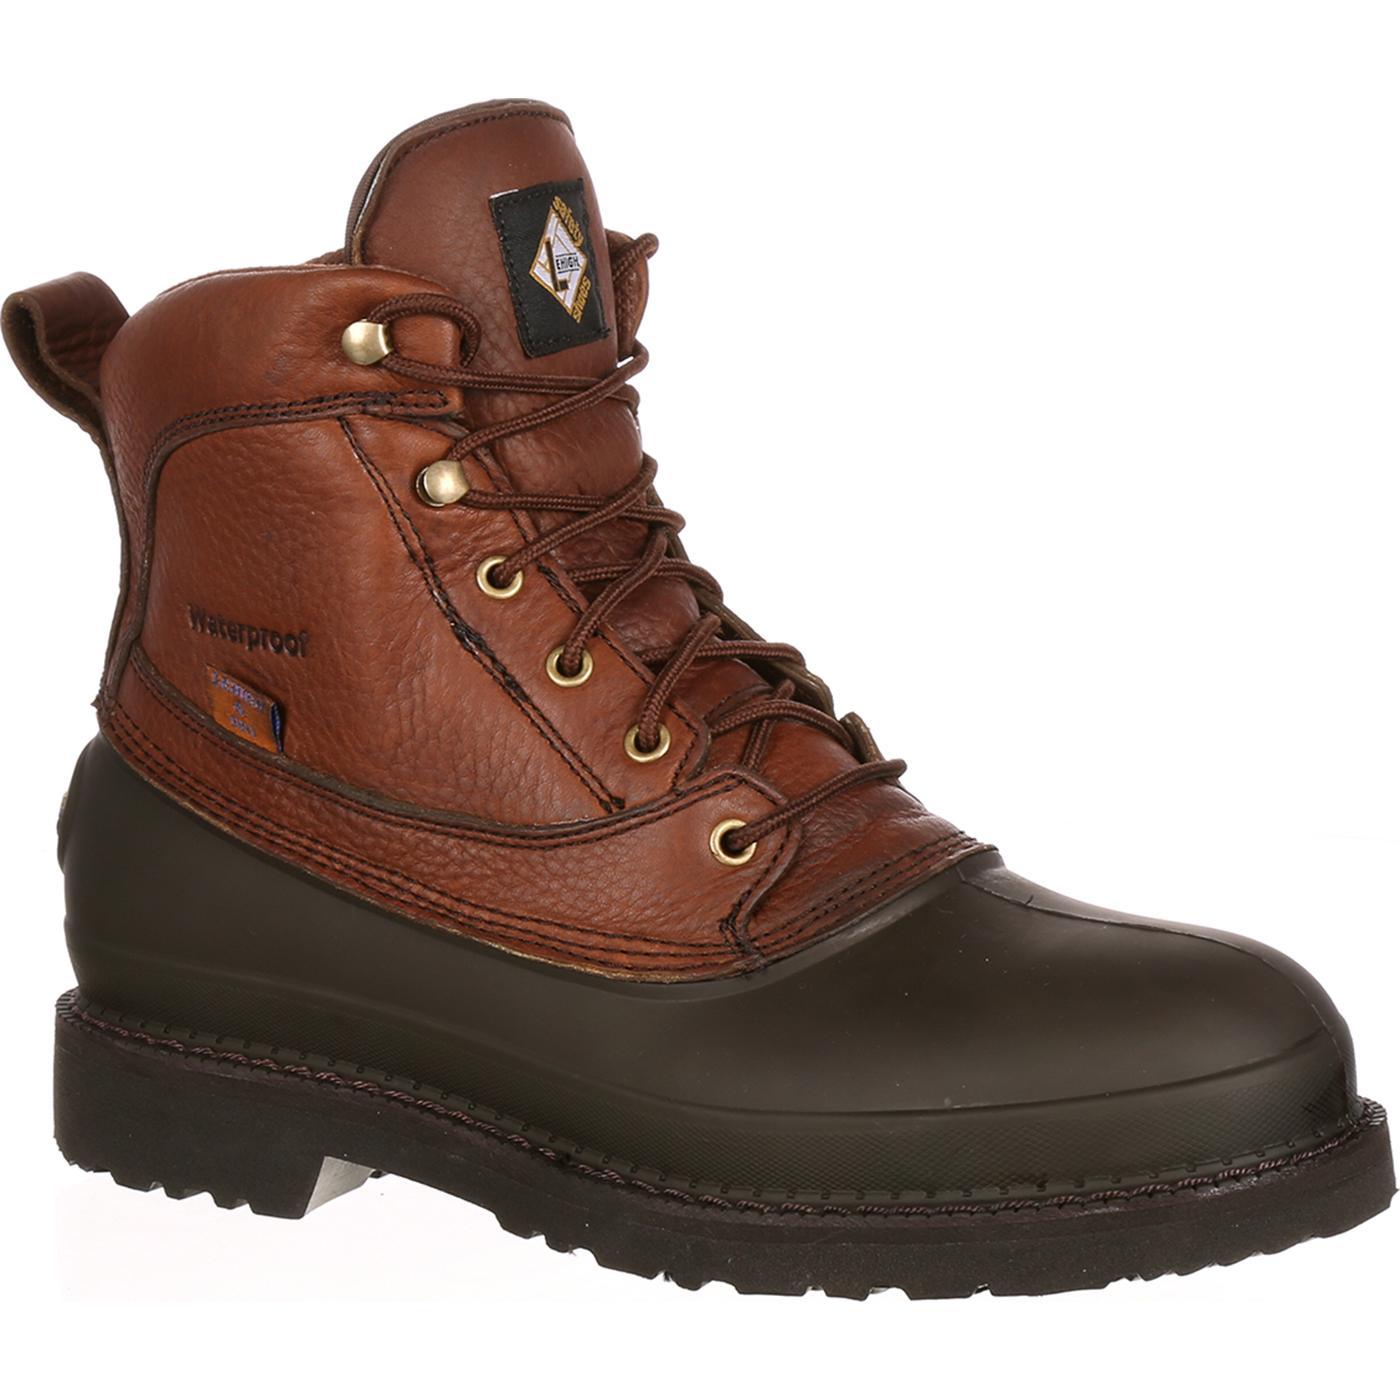 Keen Brown Boots